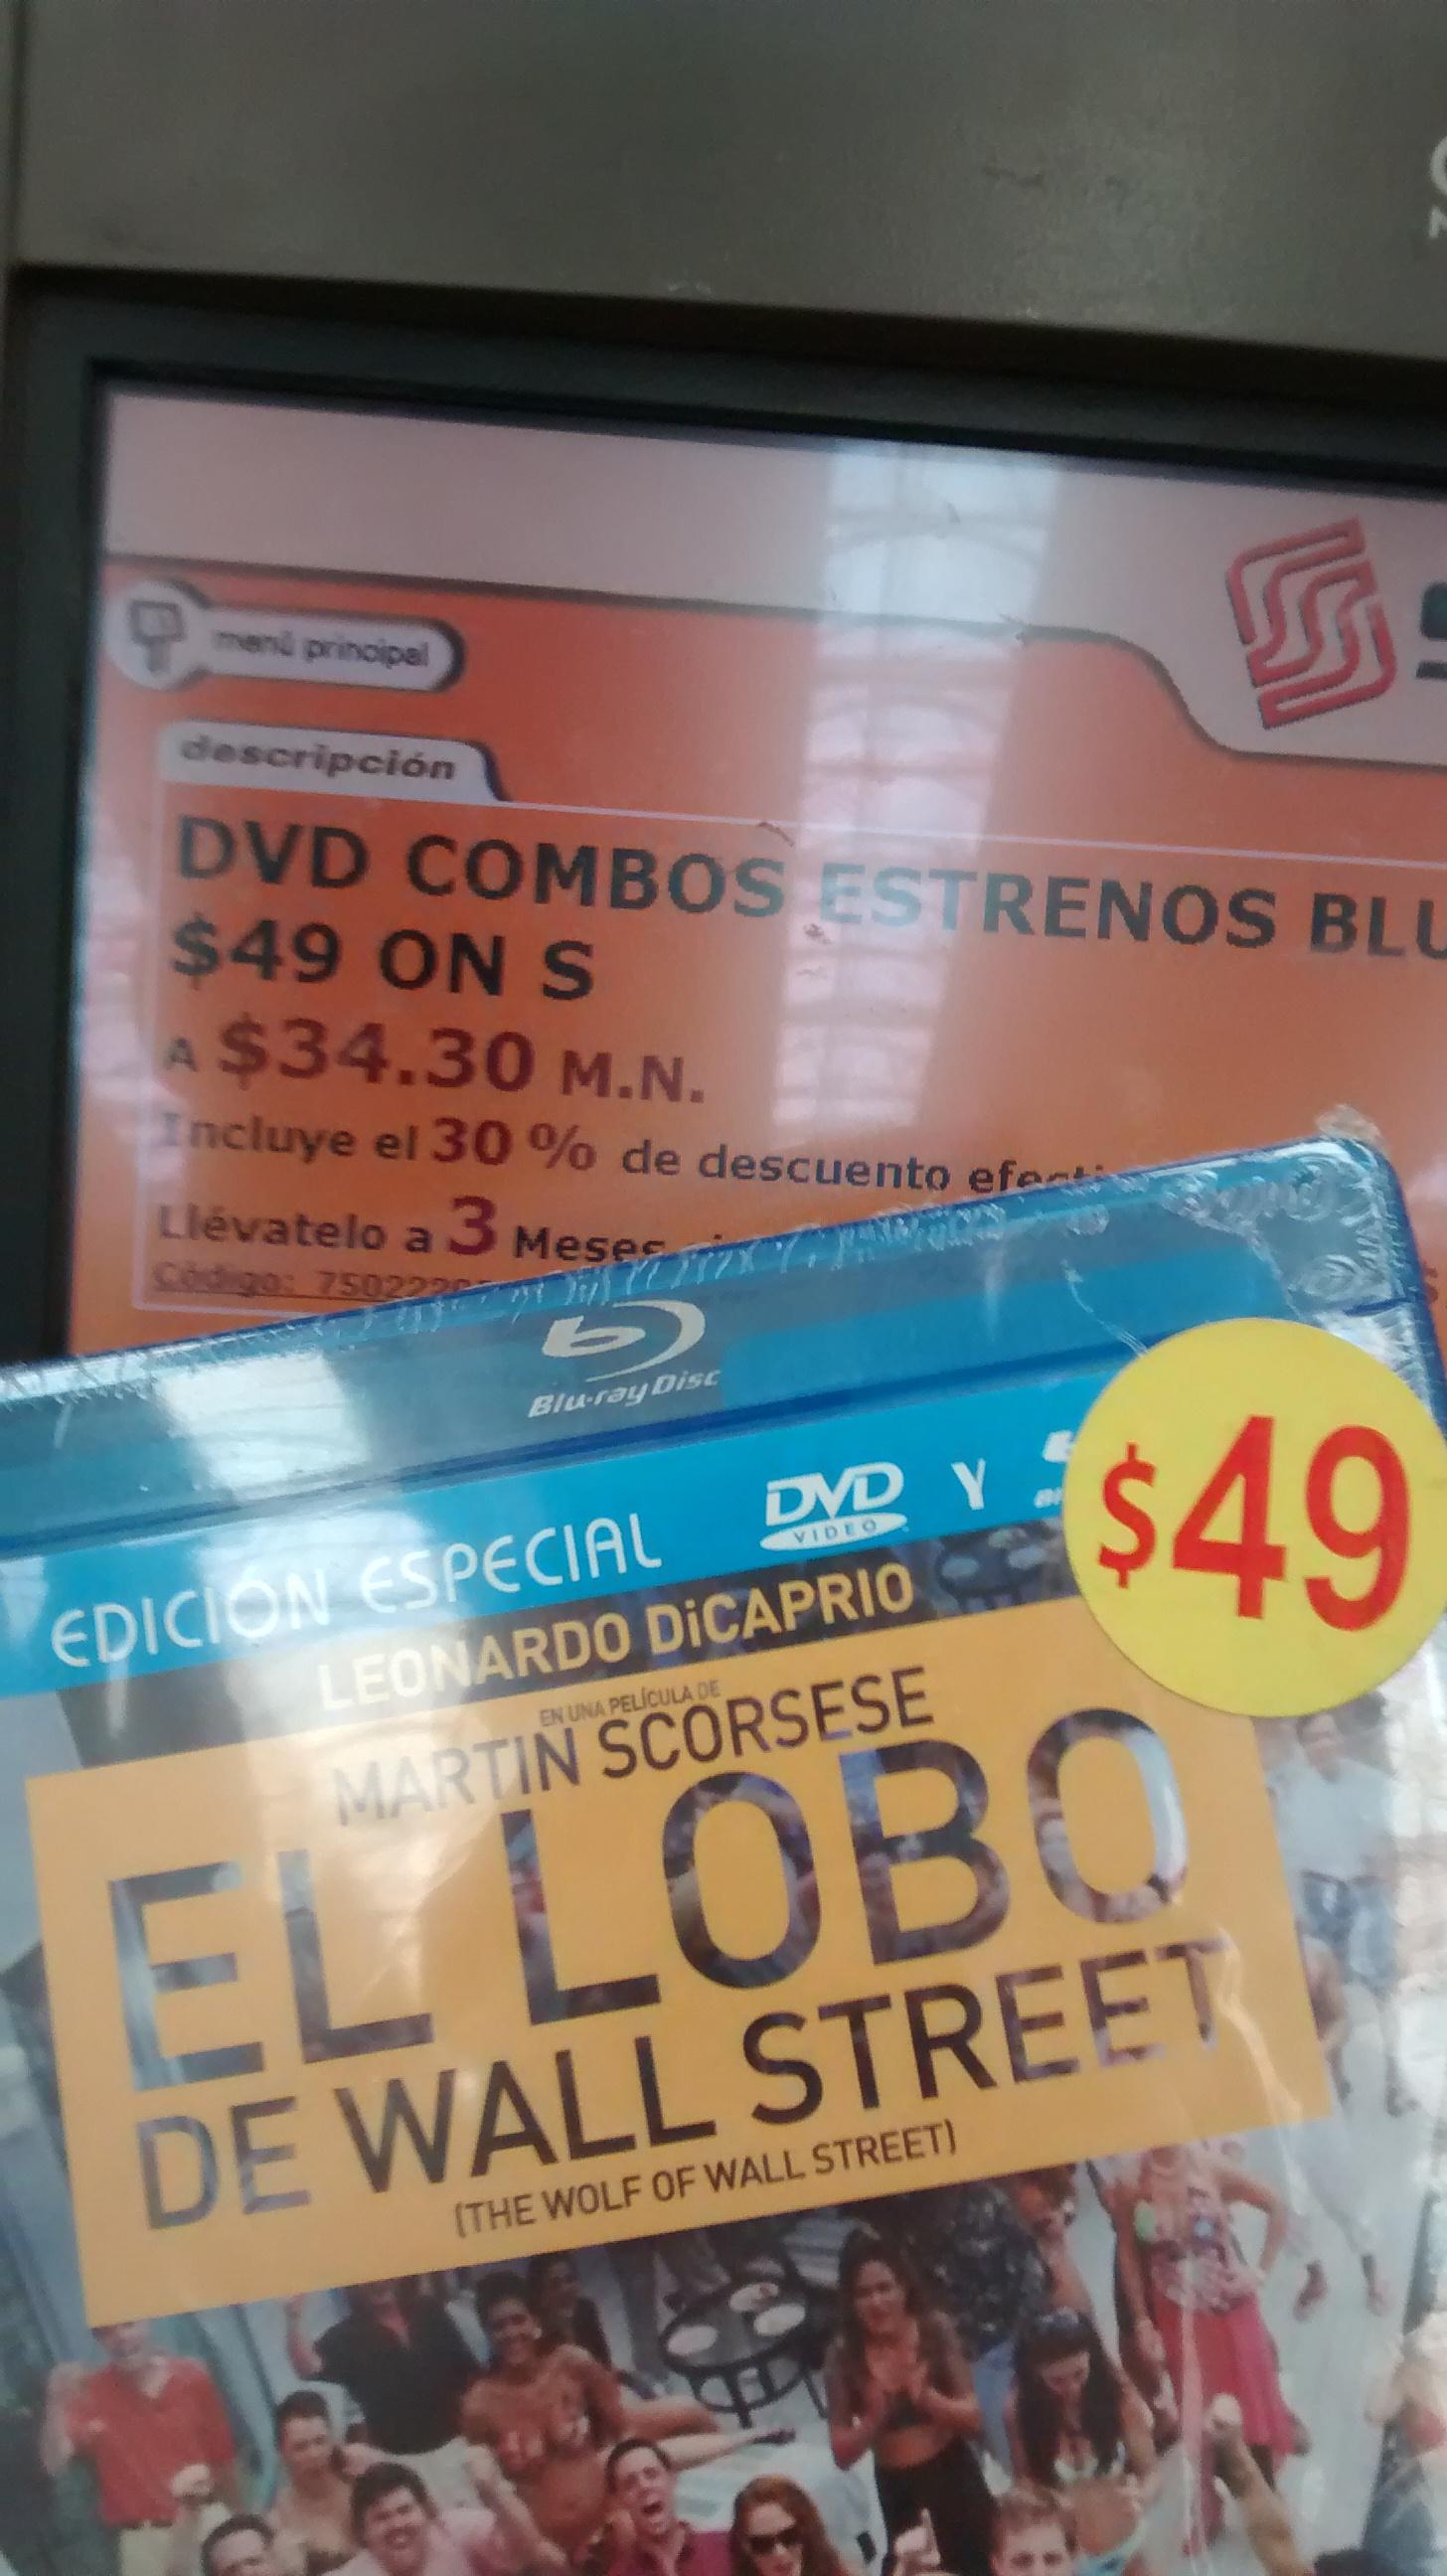 Soriana Hiper: El Lobo De Wall Street Blu Ray + DVD a 34.30